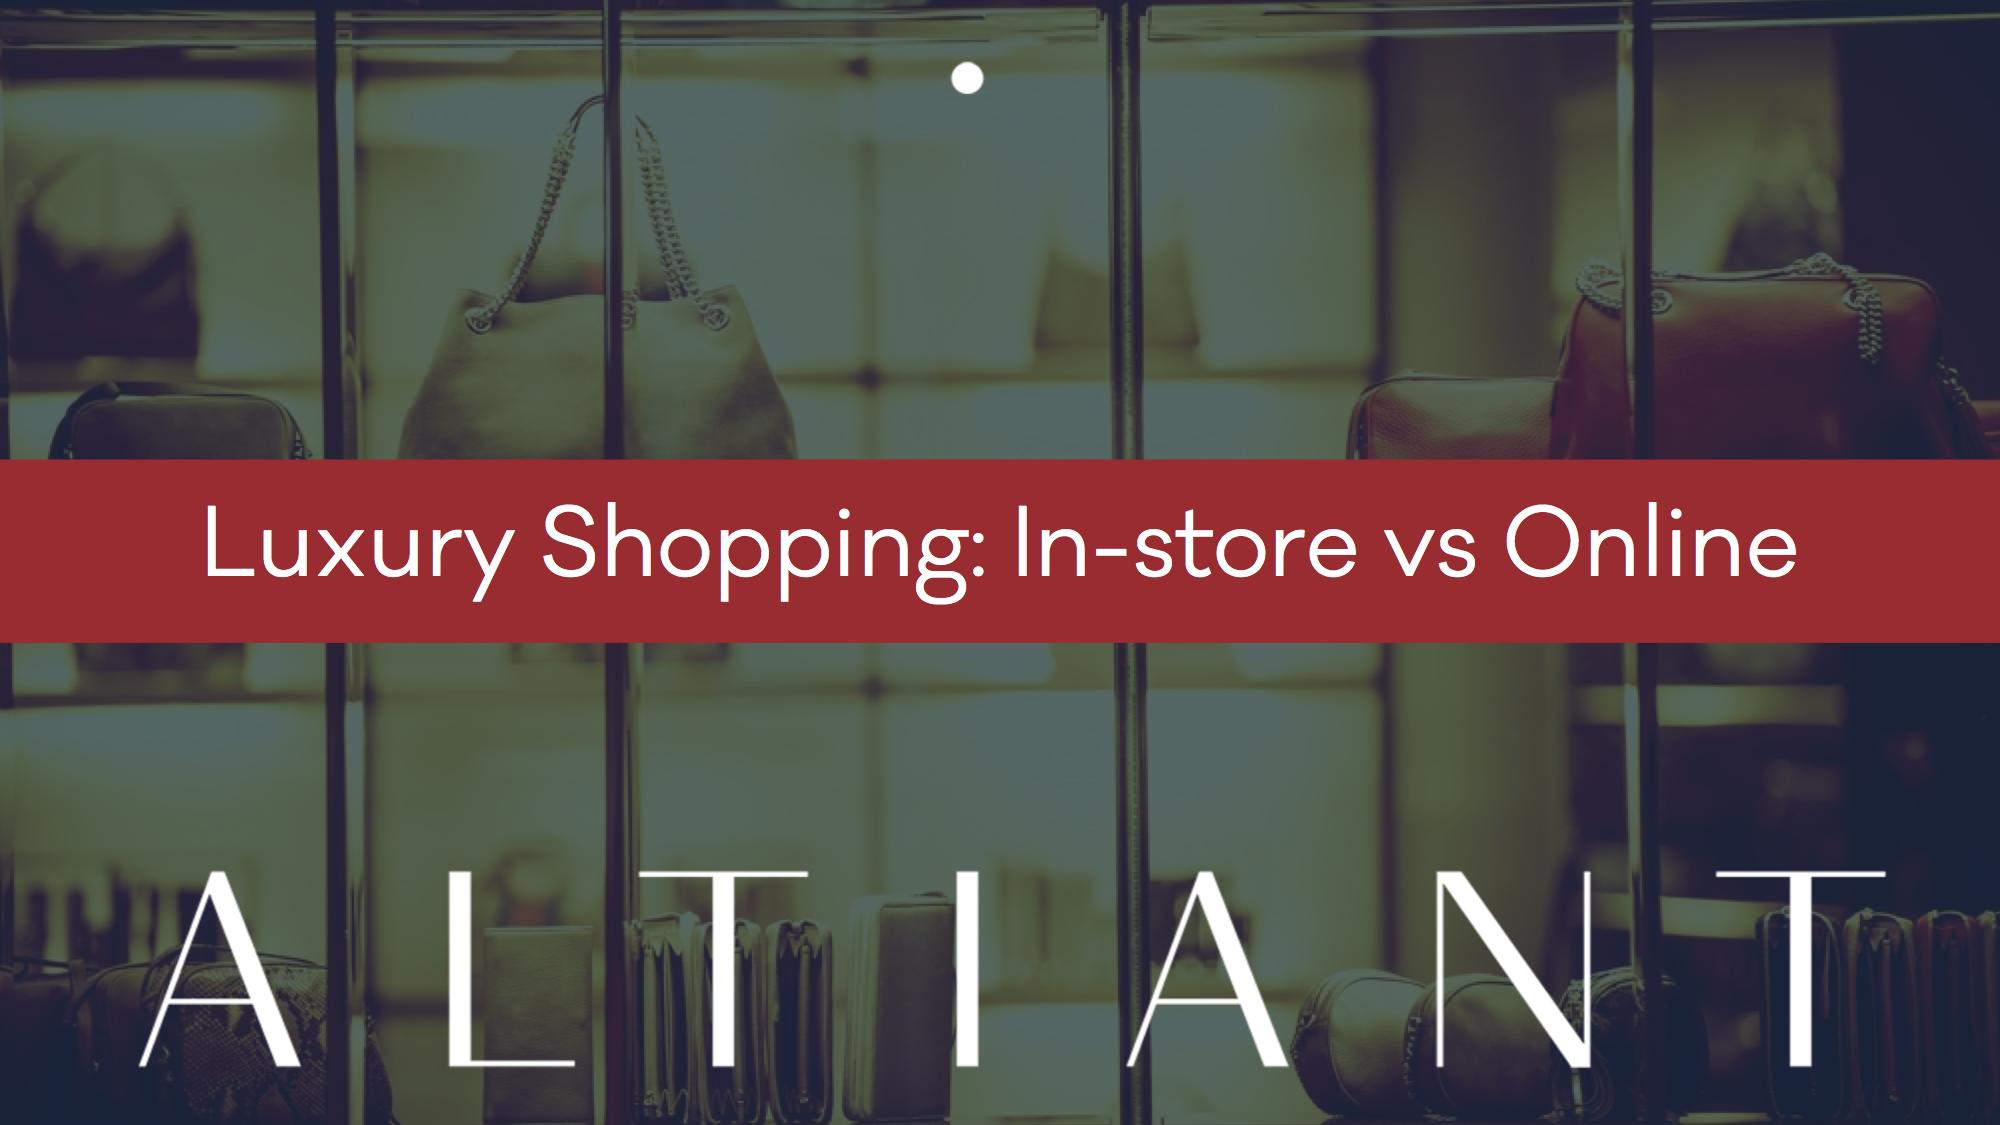 Altiant Key Luxury Trends p3 copy.png